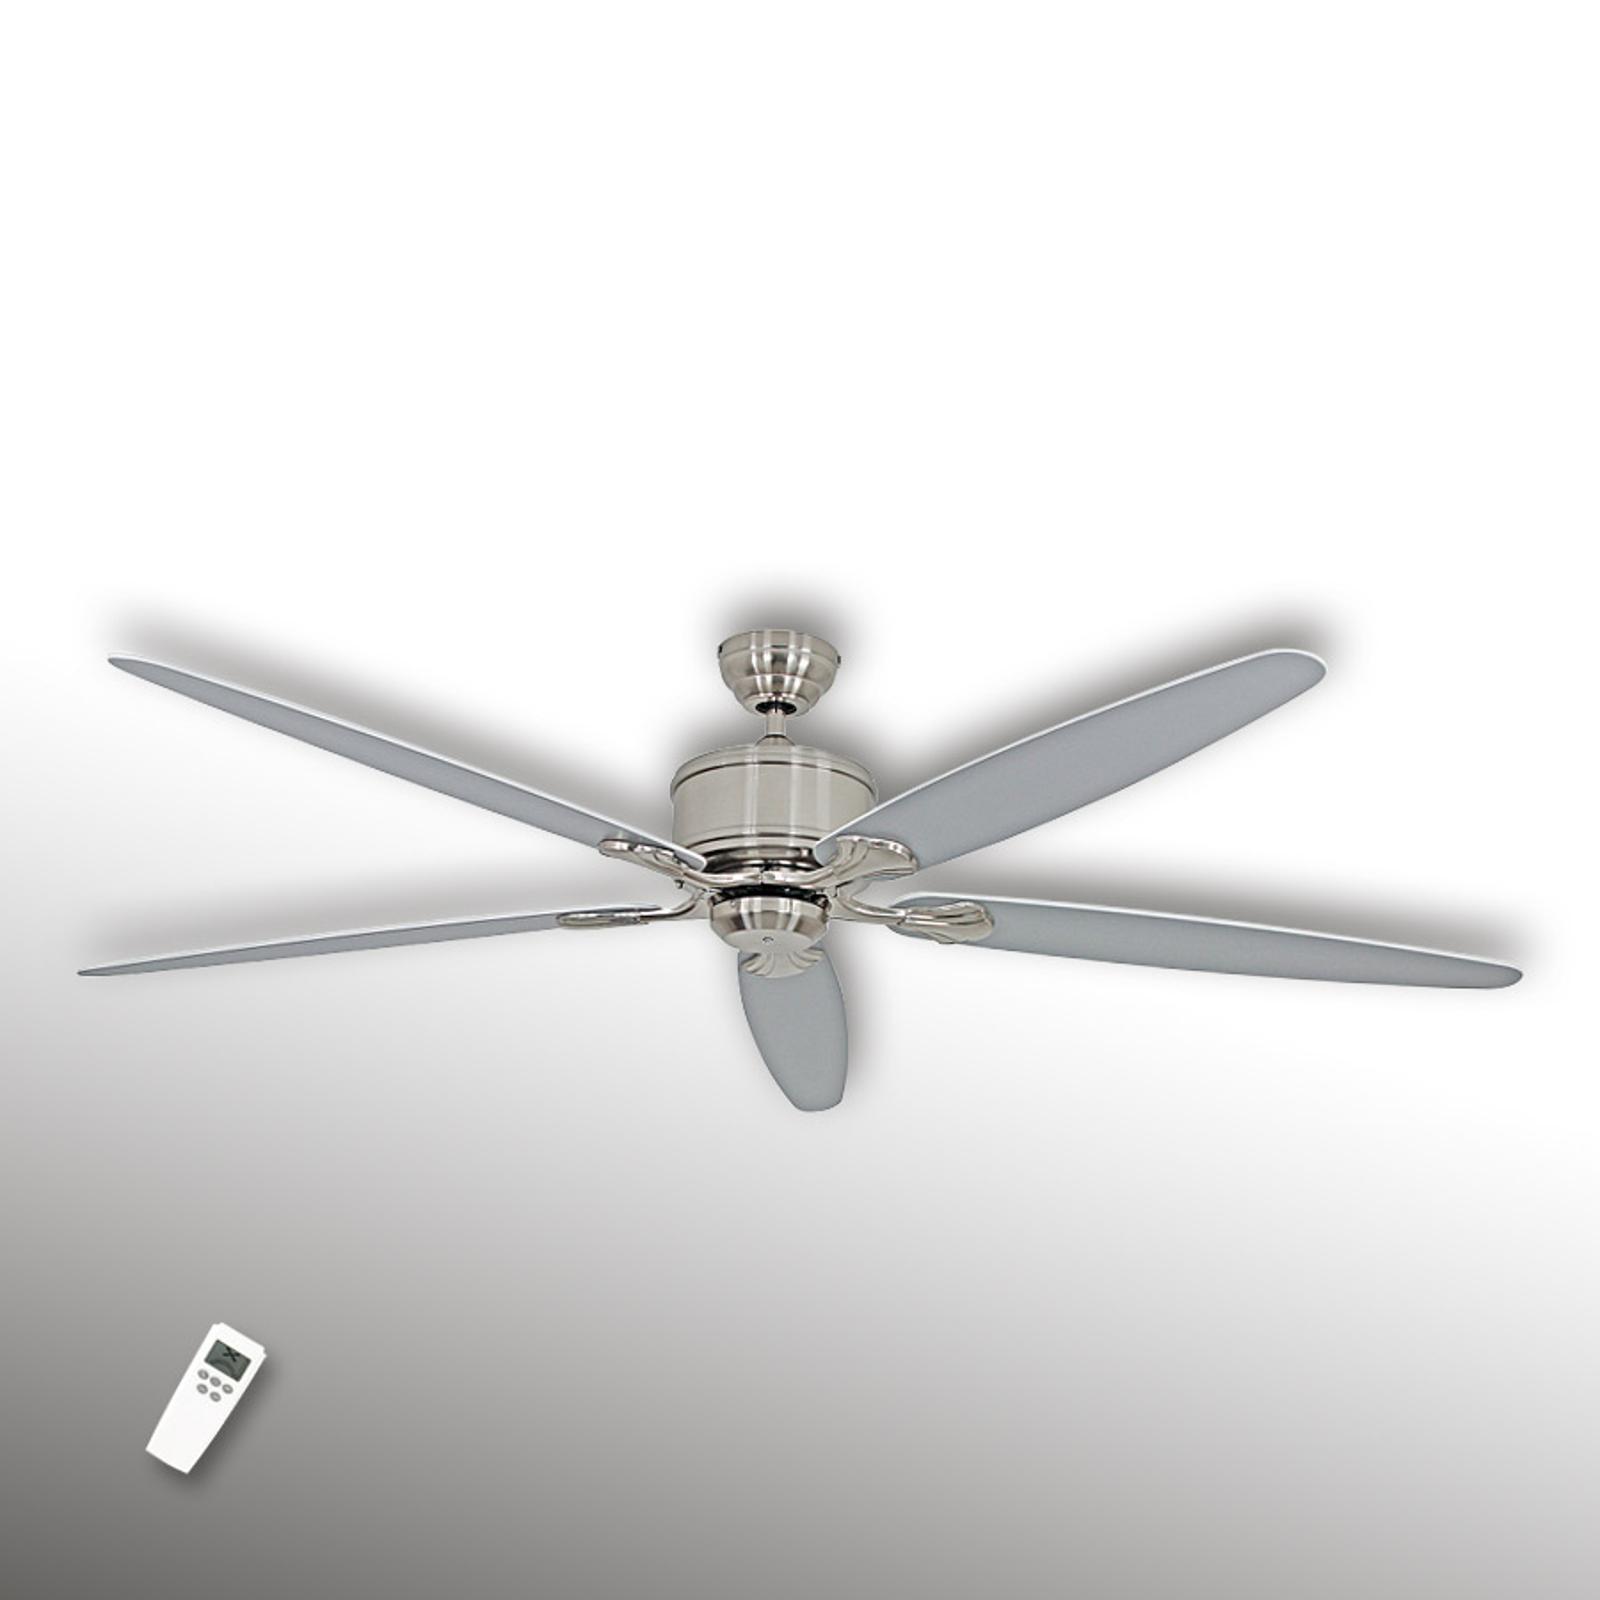 Efficiente ventilatore a pale Eco Elements, cromo